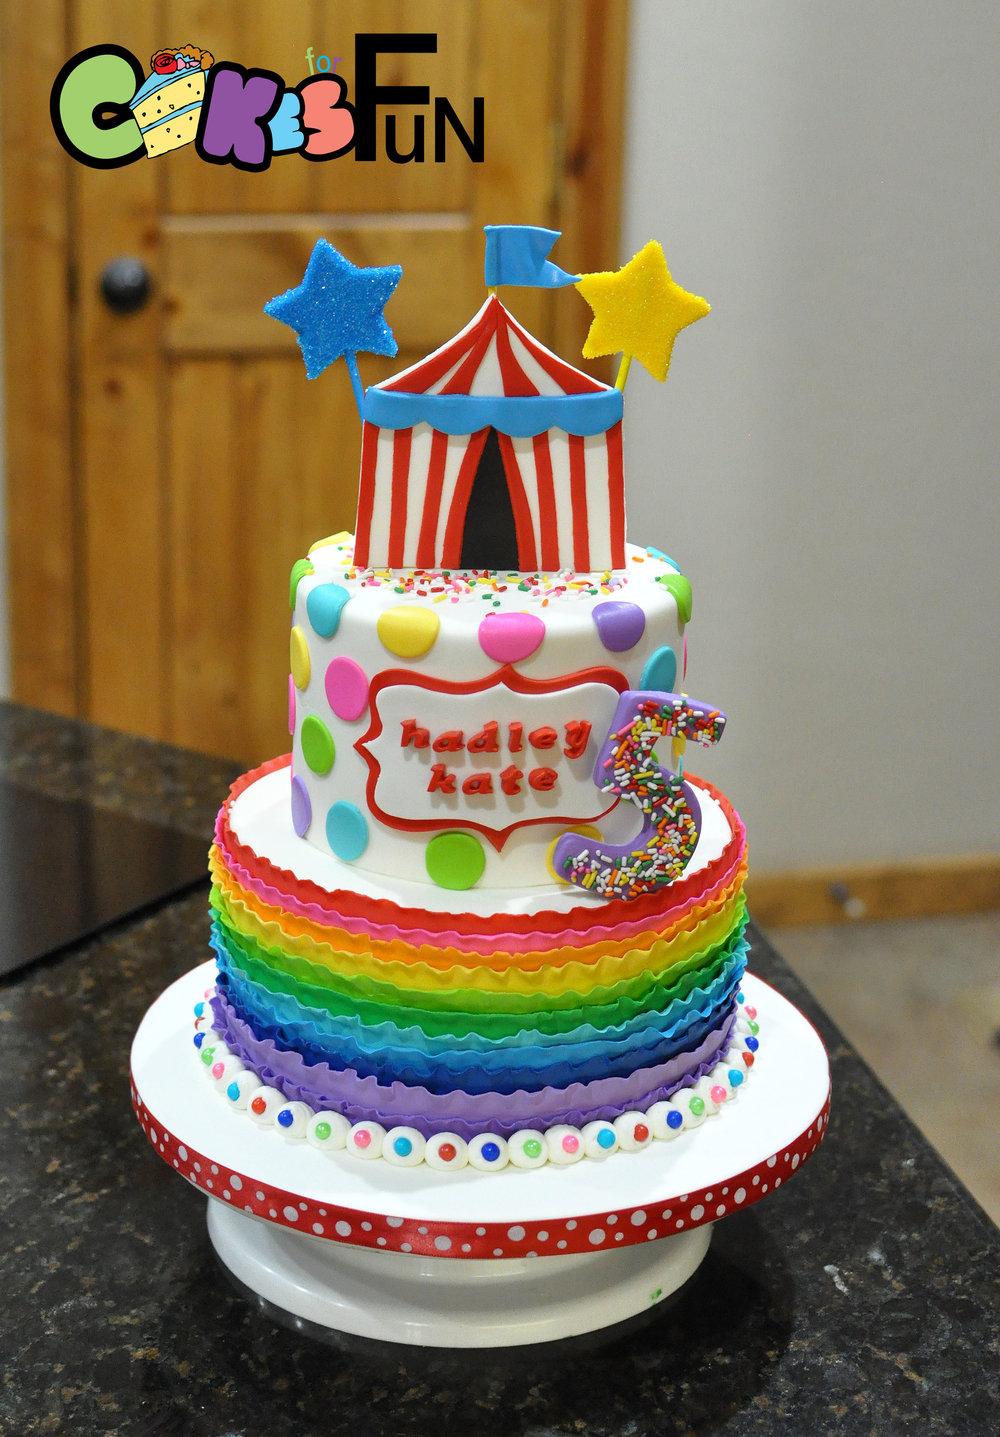 circus cake-doran-06092018.jpg